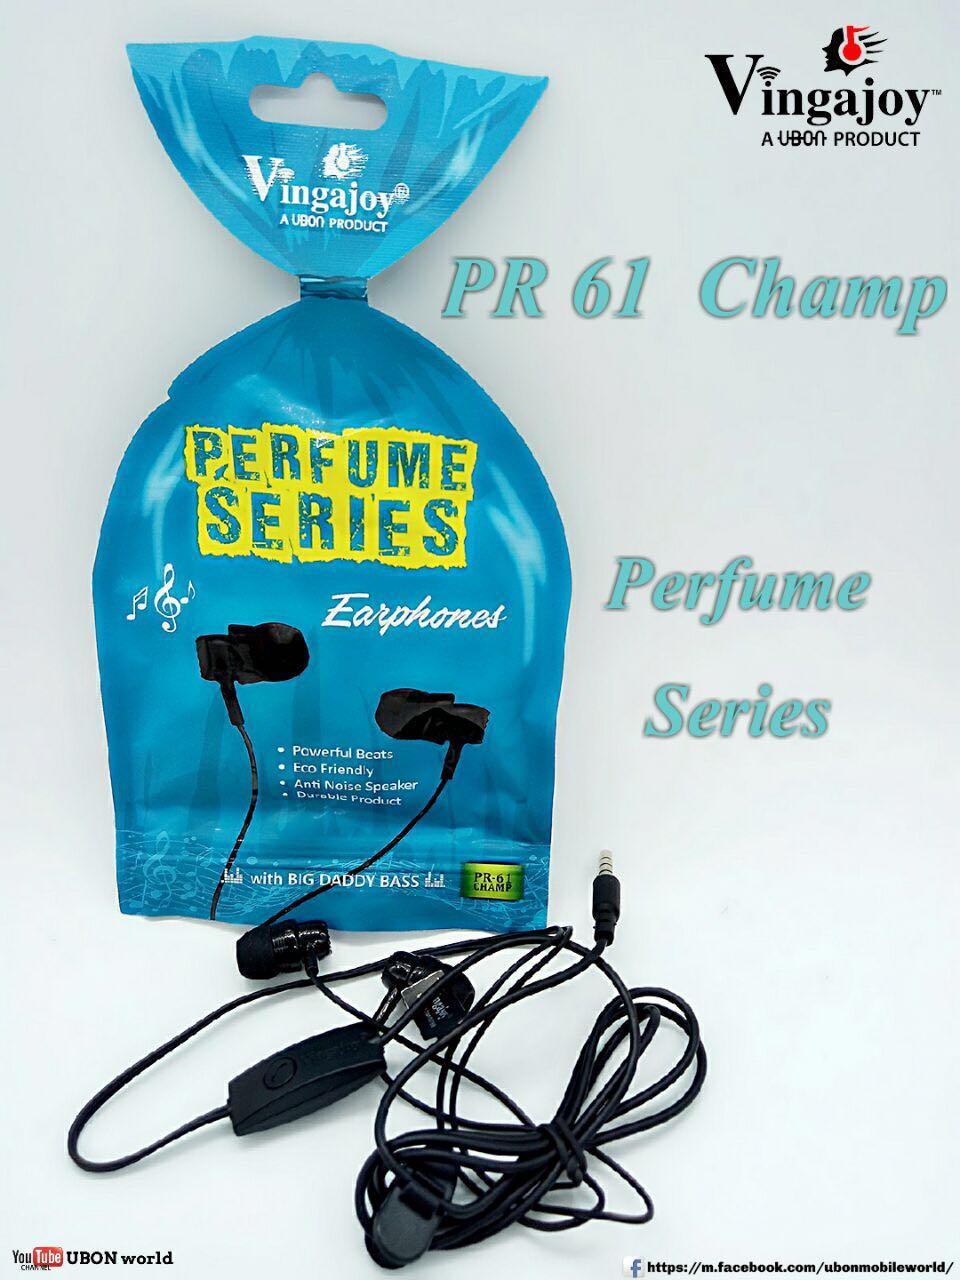 dfa792a5ae9 Vingajoy UBON Perfume Series Handsfree